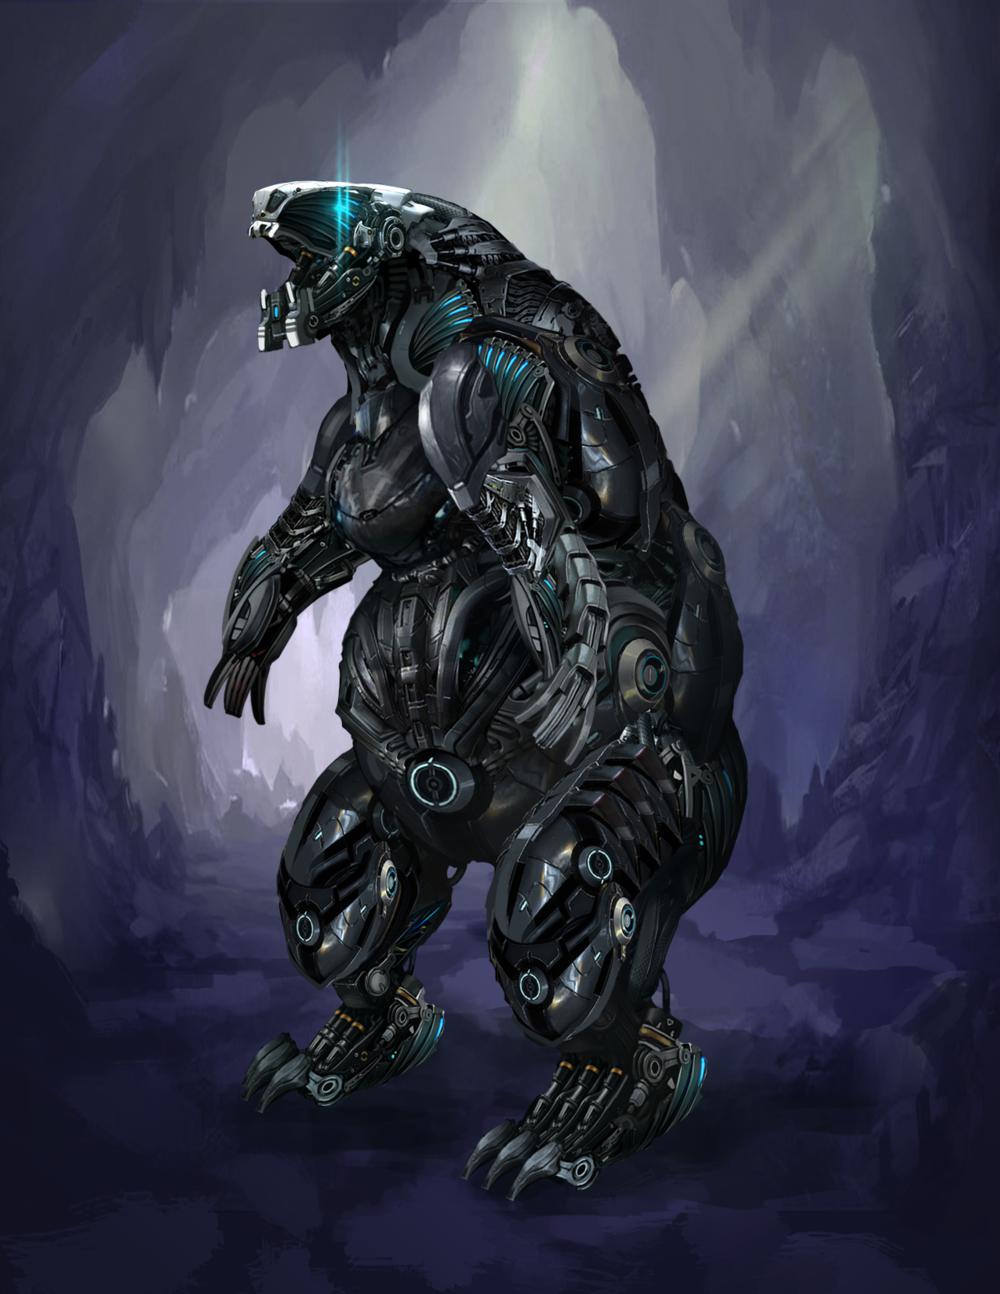 Robotic_bear_-_Huy_Mai_Van.png